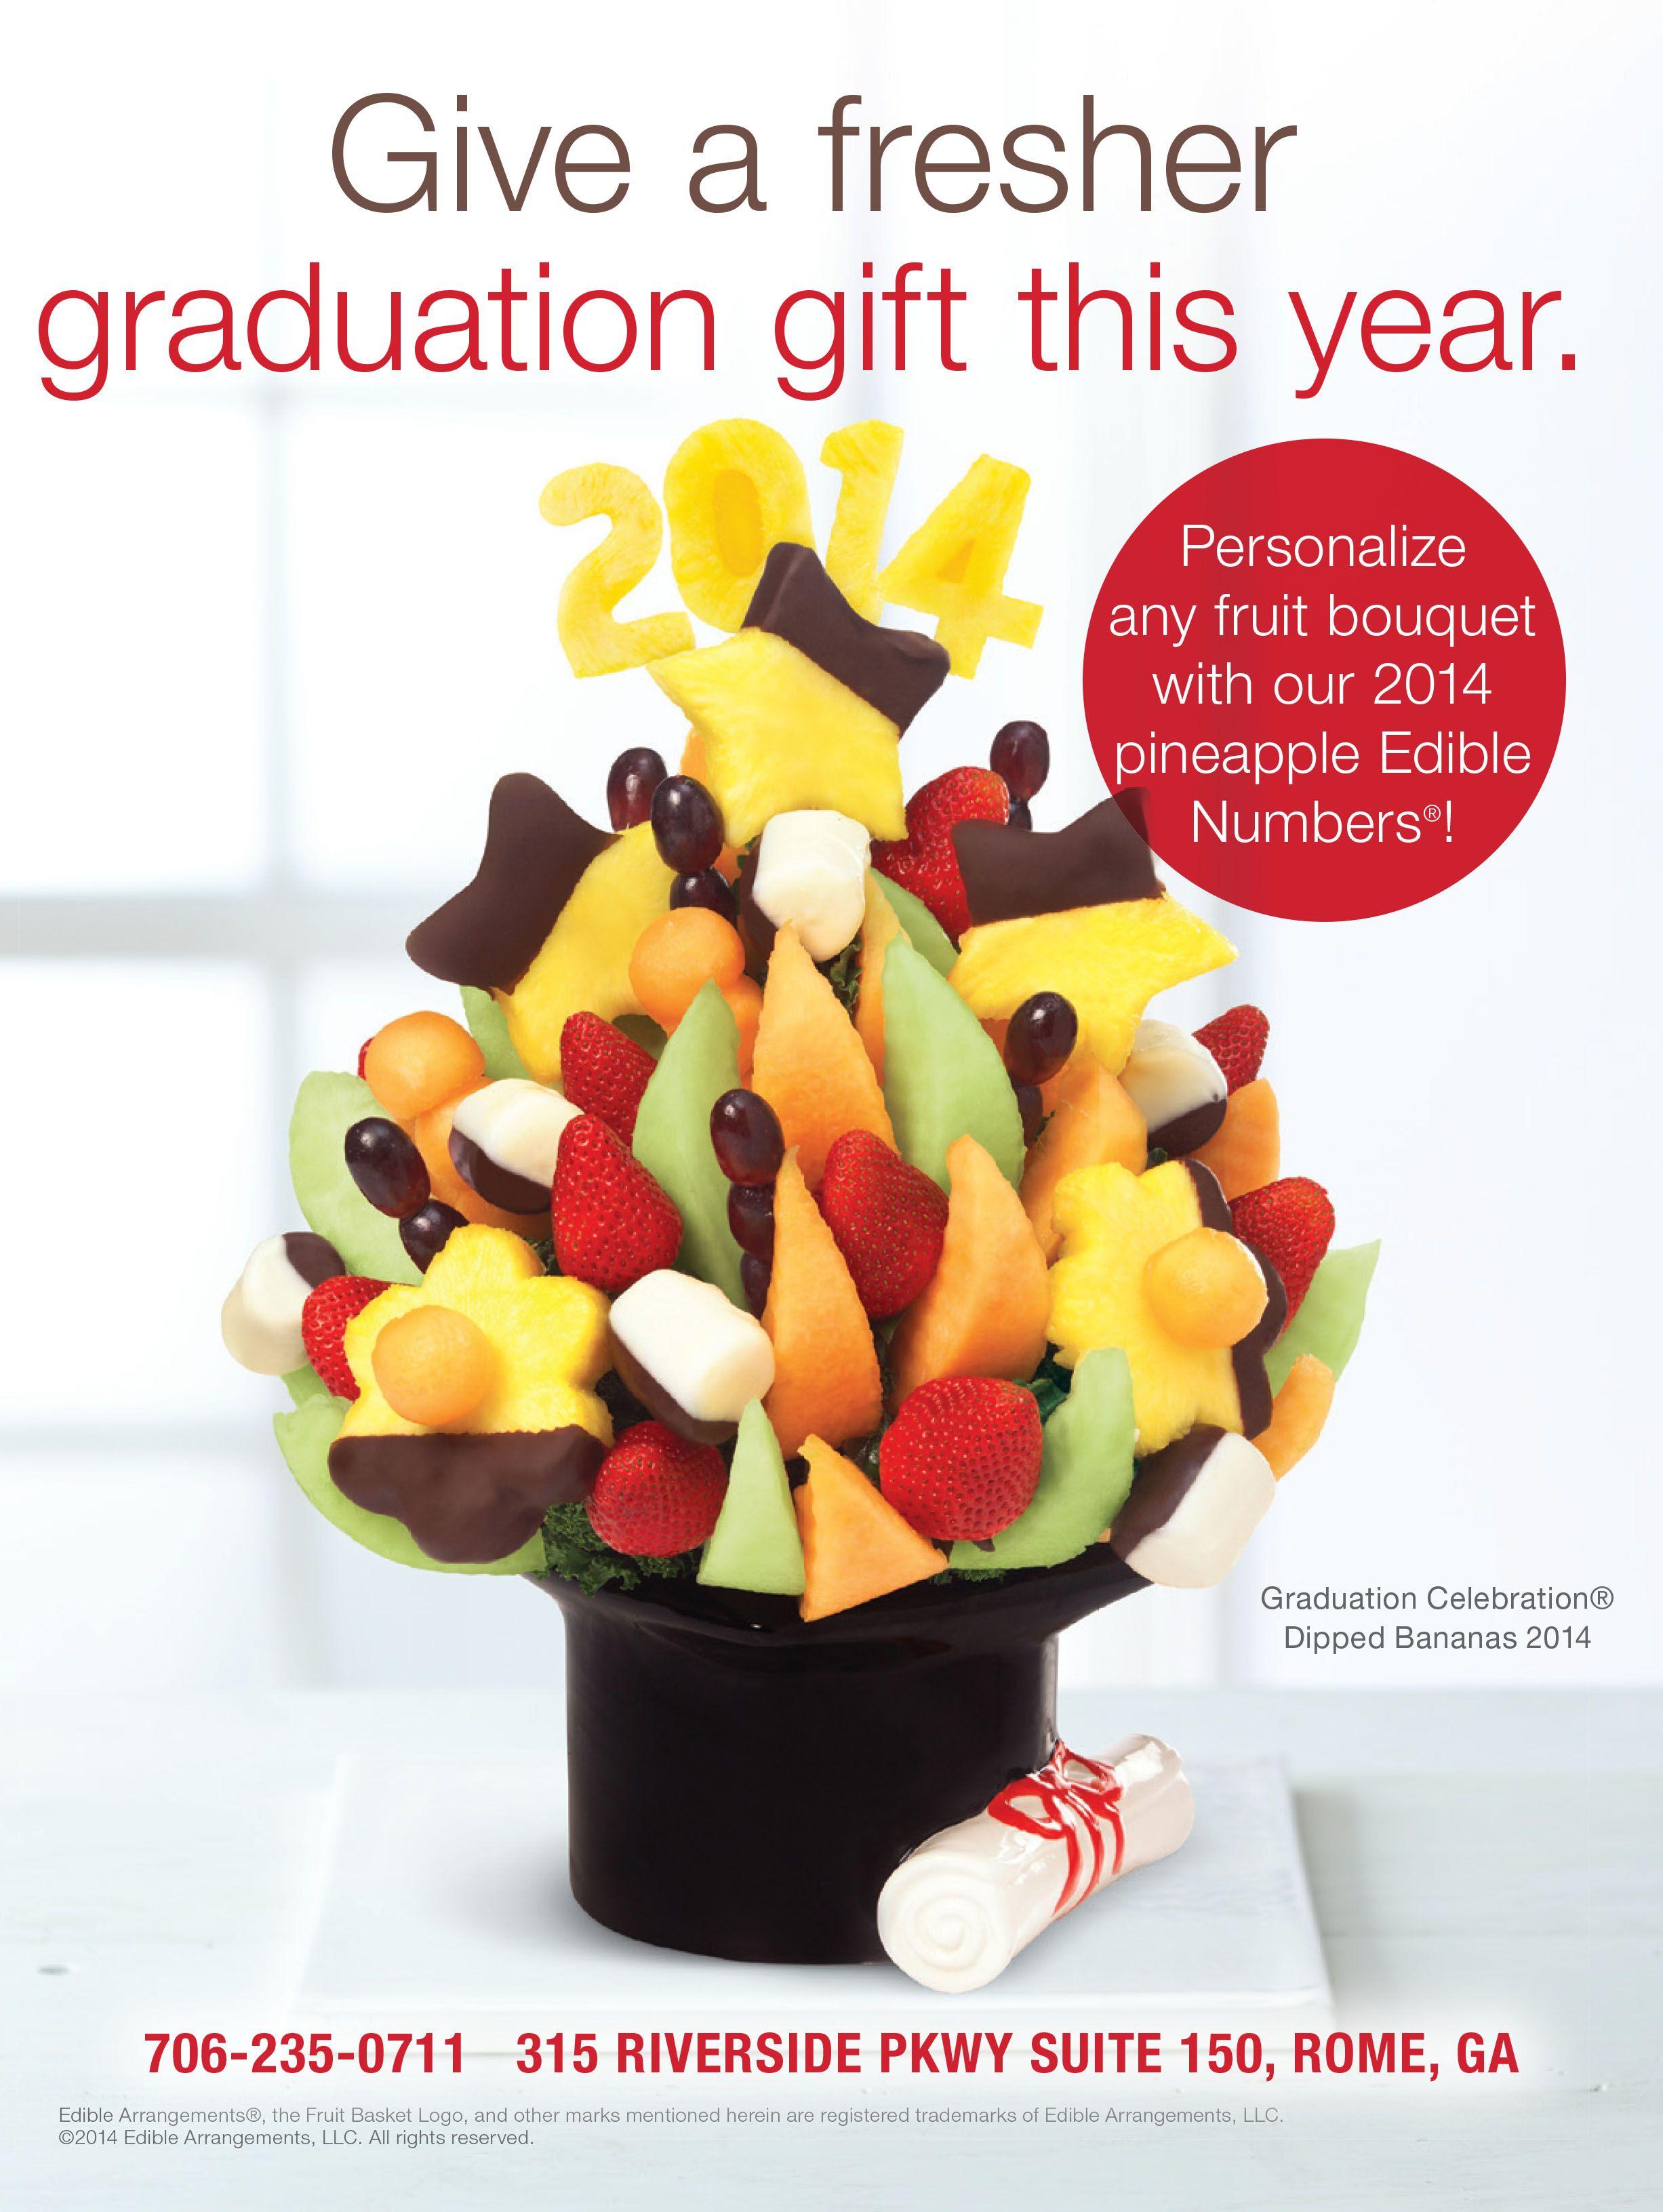 Pin By V3 On Advertising Edible Arrangements Graduation Celebration Banana Dip